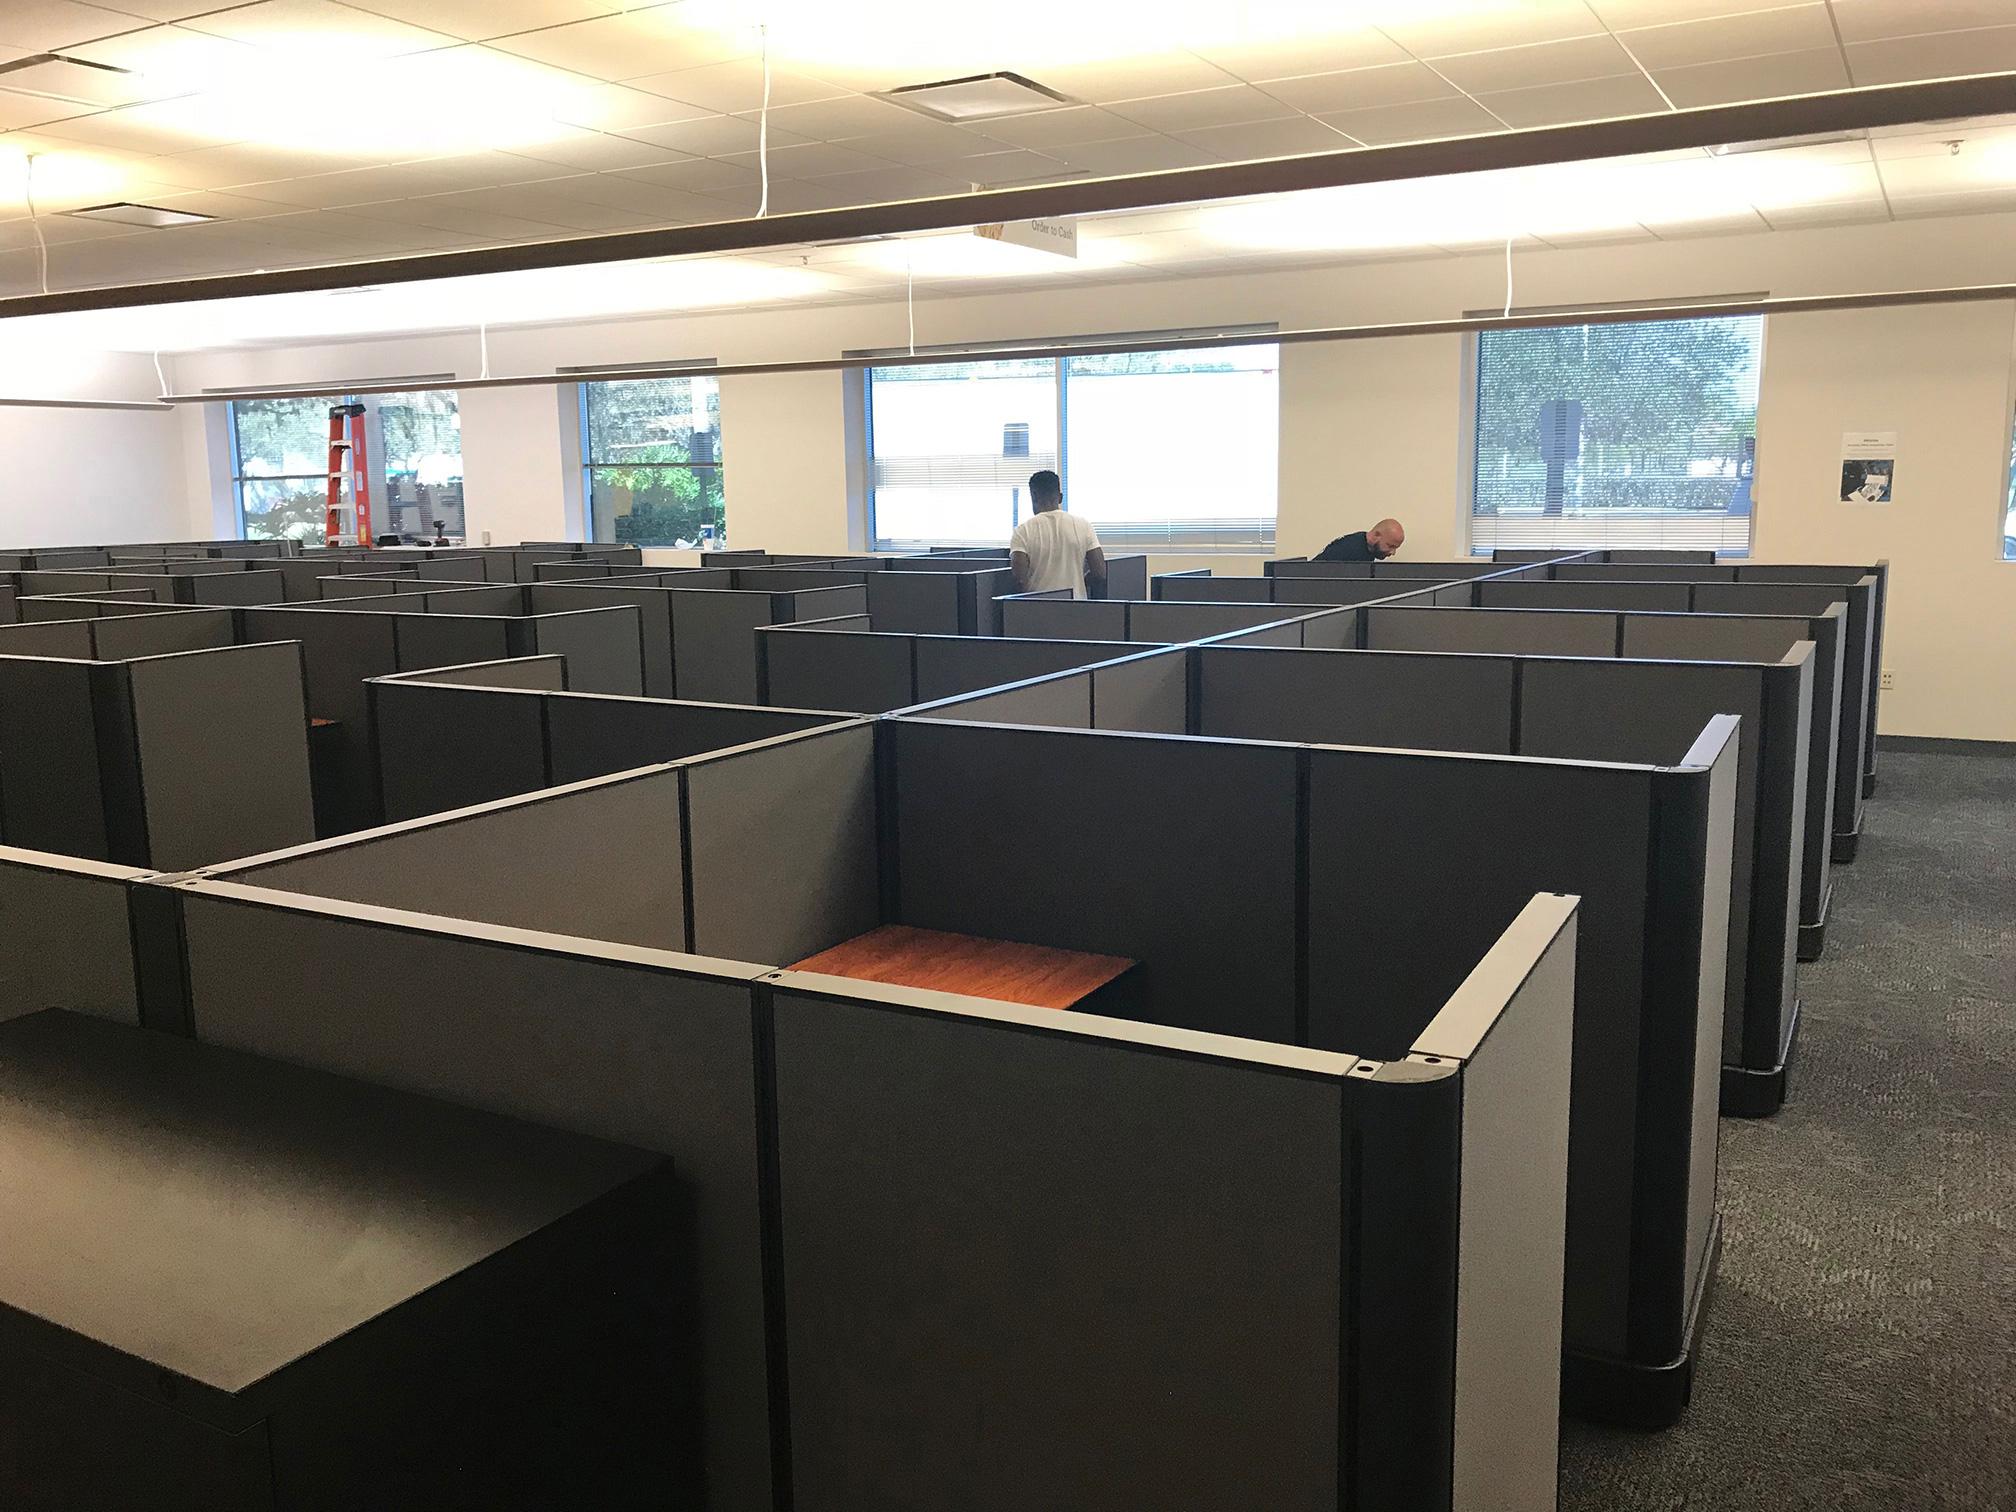 office-cubicles-for-sale-in-defuniak-springs-florida-3-1.jpg